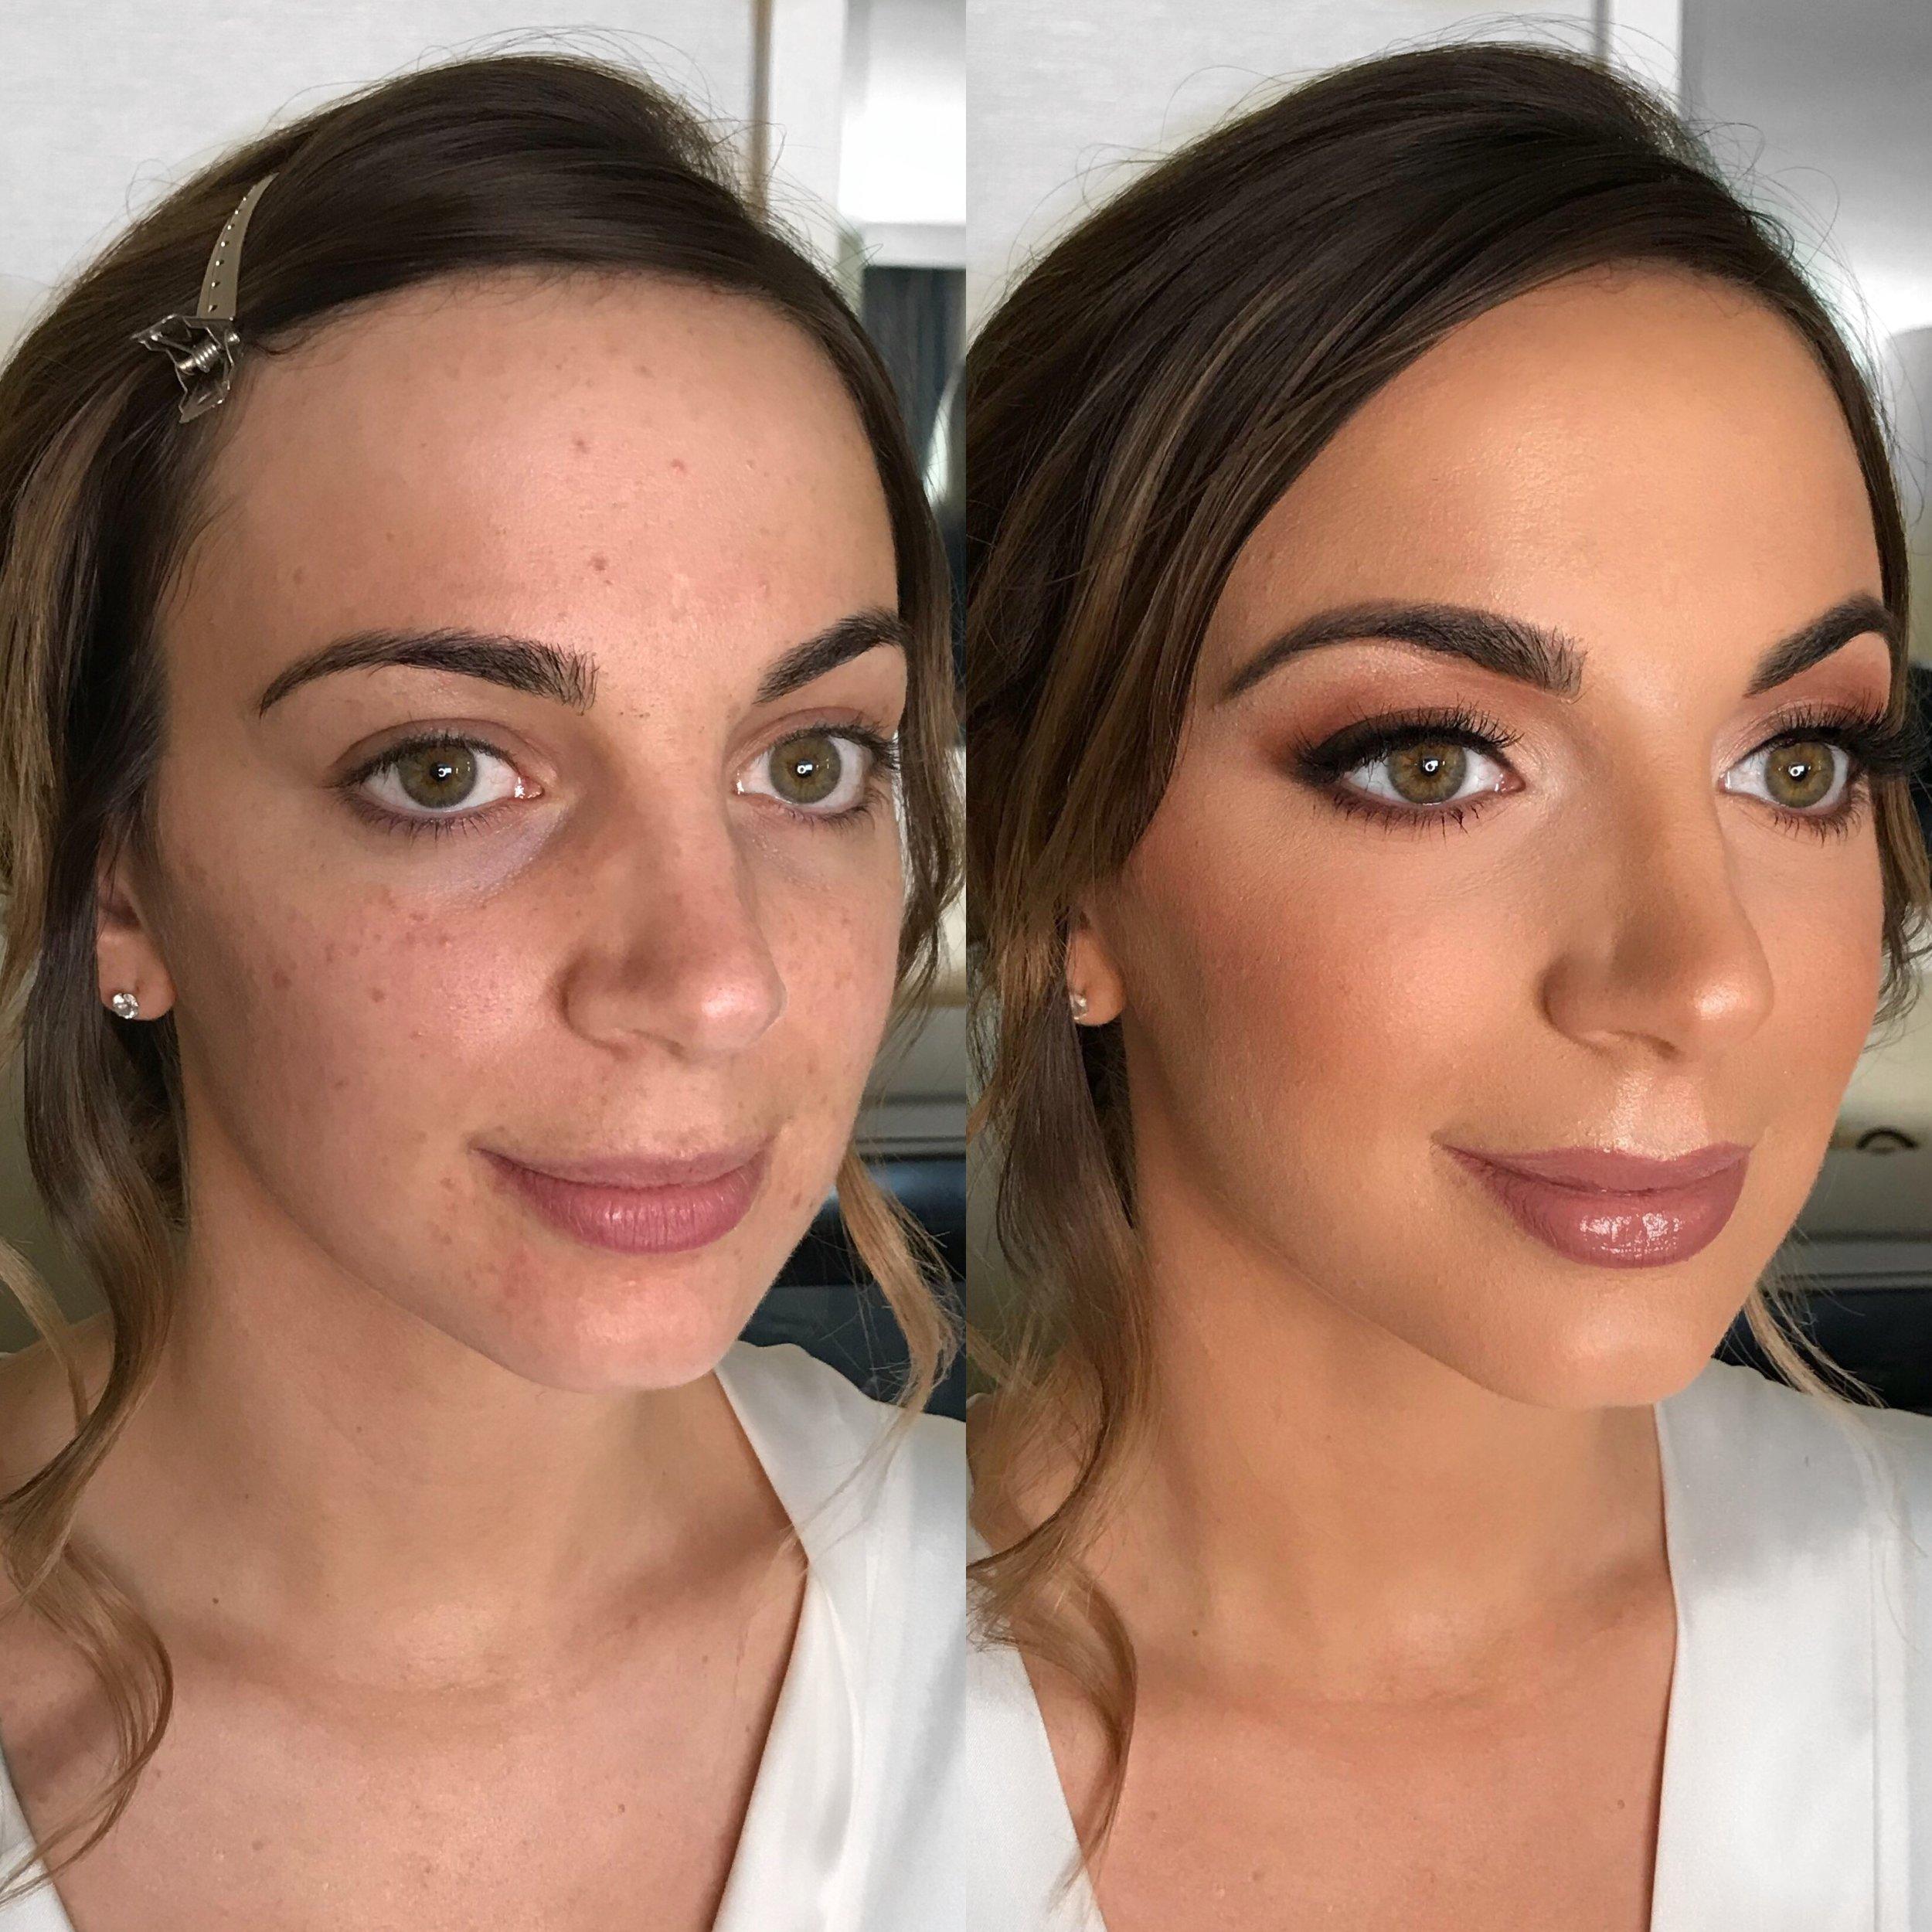 Patricia_Castro_Makeup_Los_Angeles_Makeup_Artist_12.JPG